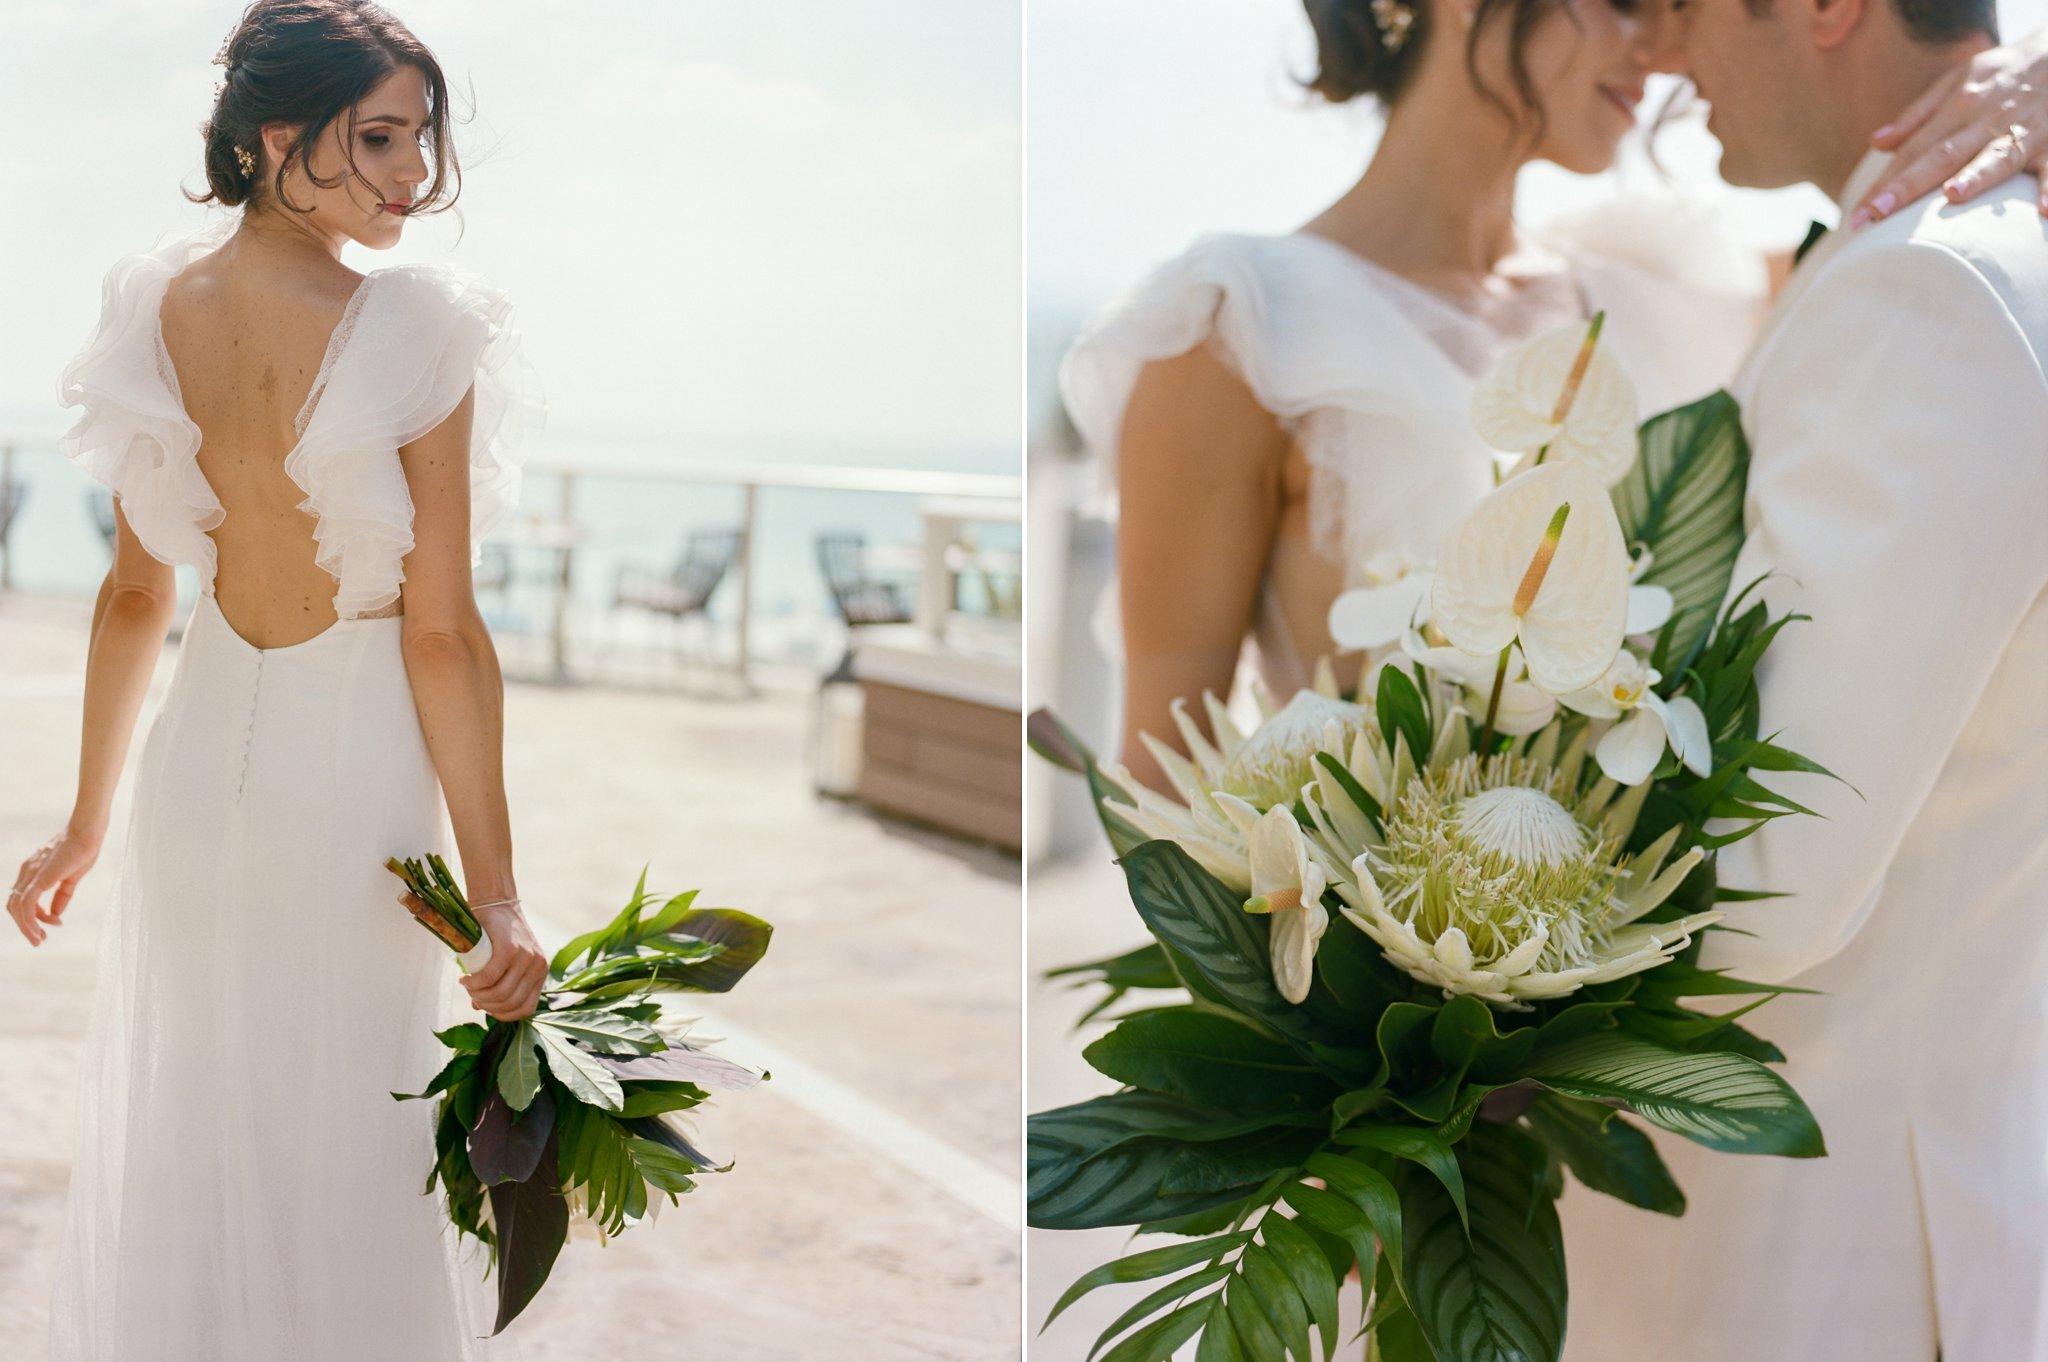 jw marriott marco island wedding photographer marco island wedding photographer shannon griffin photography_0202.jpg